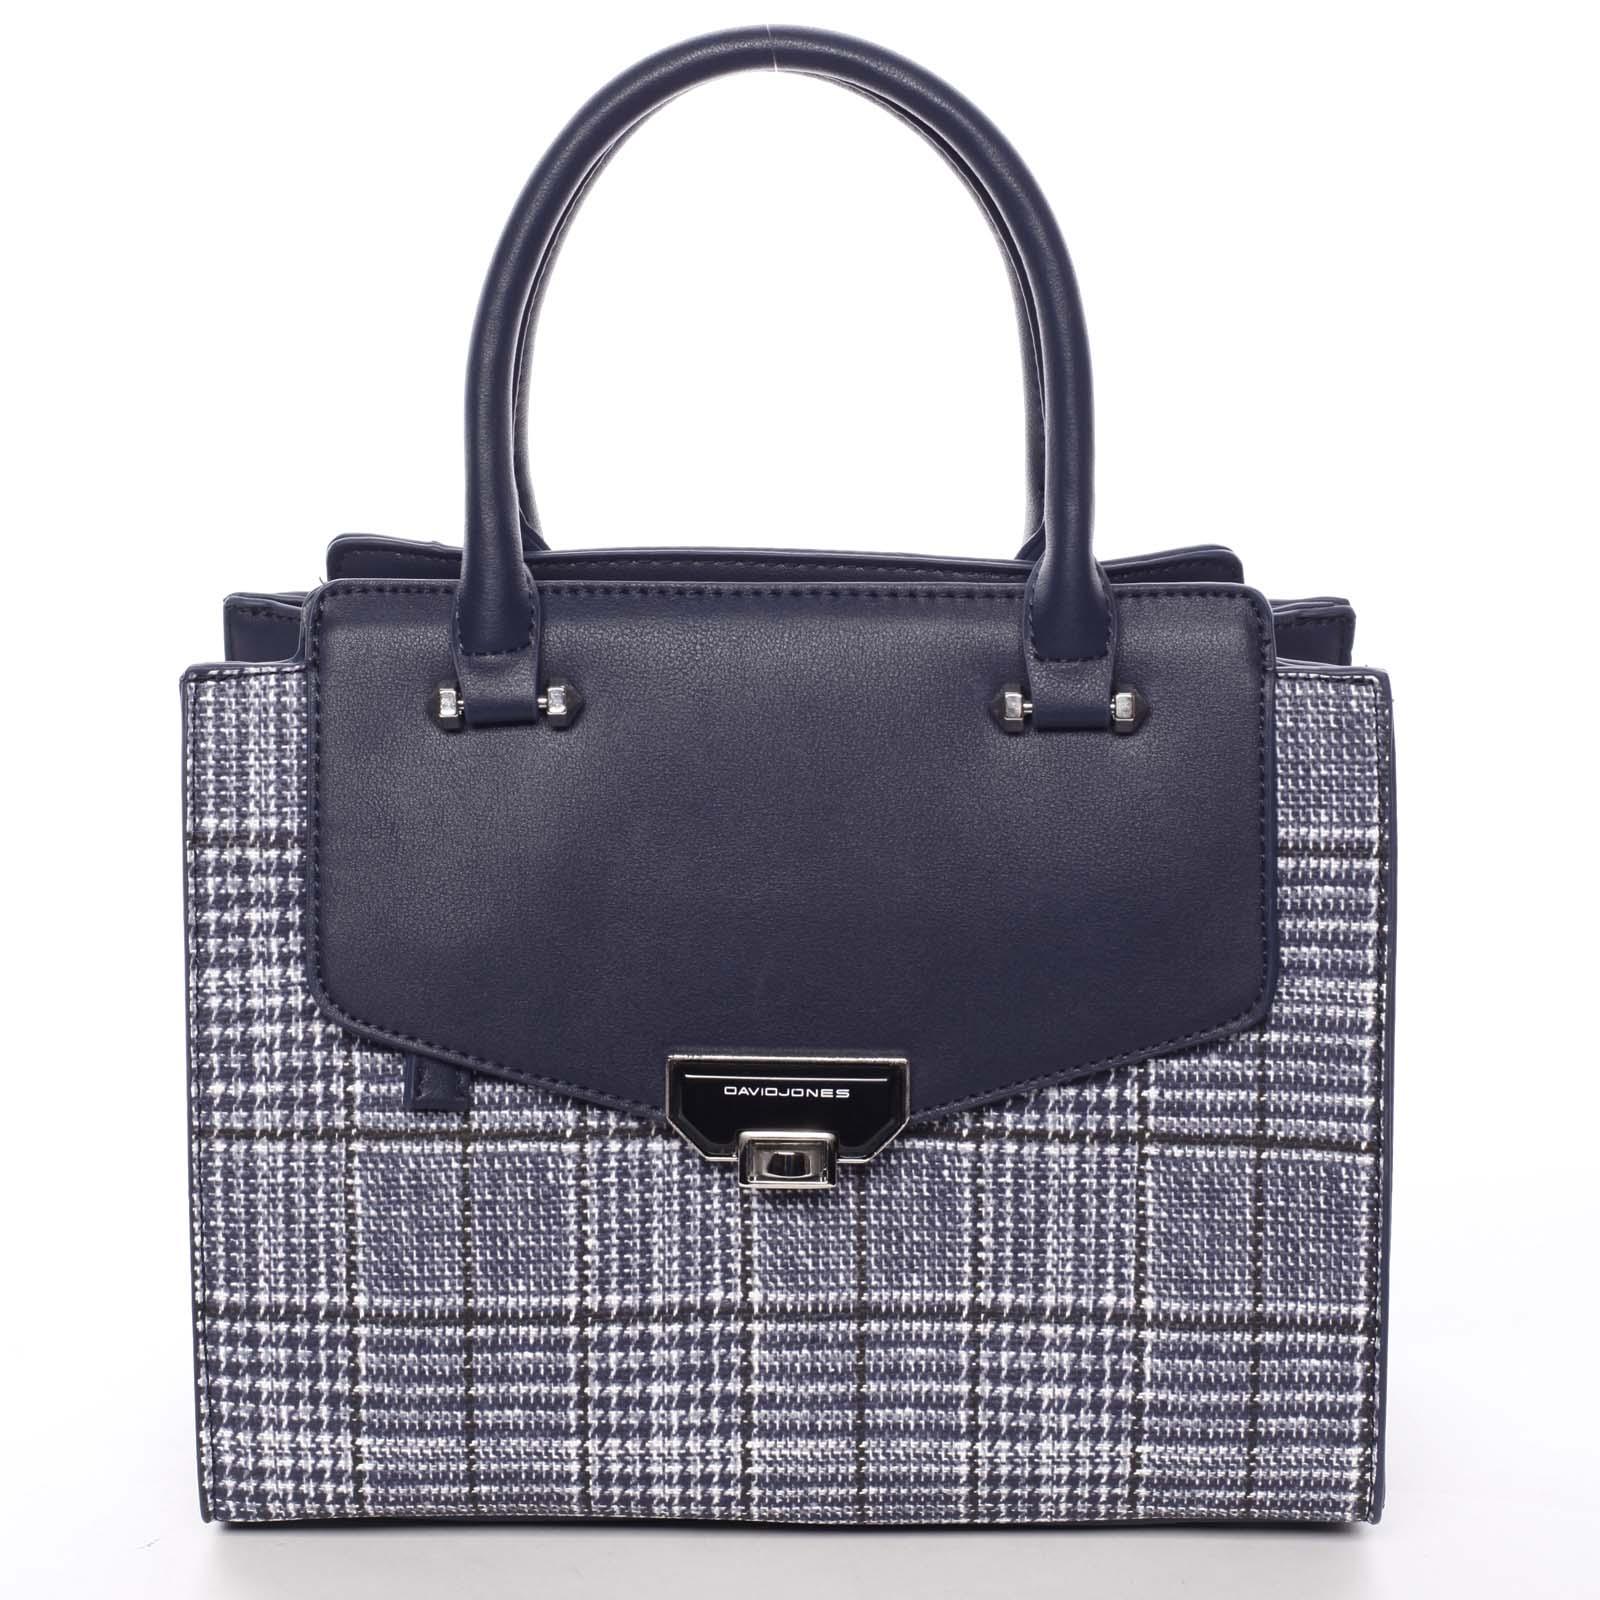 Luxusná dámska tmavomodrá kabelka do ruky - David Jones Agathi